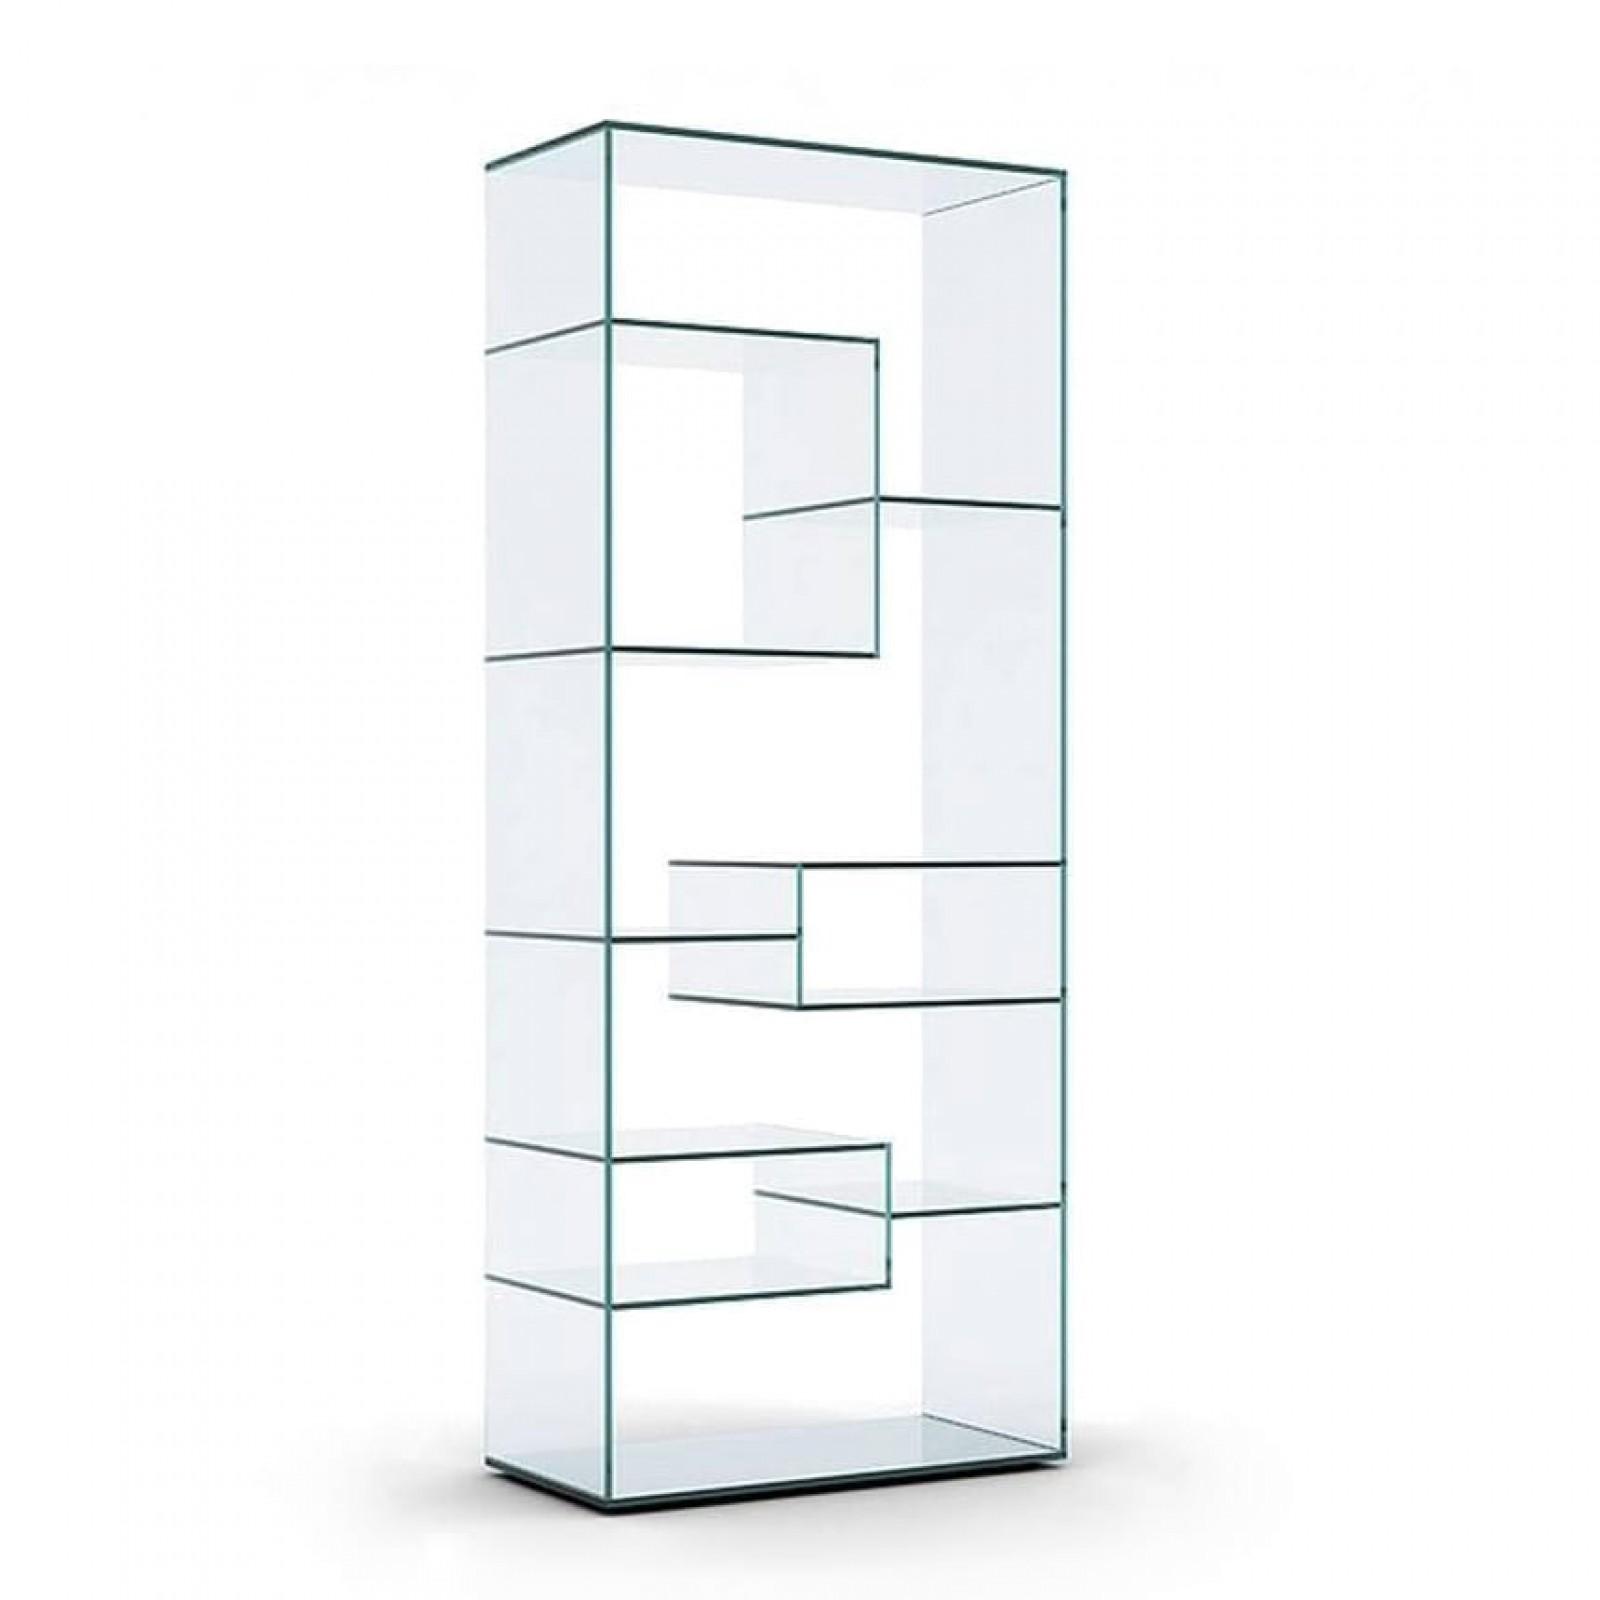 Liber A Glass Display Unit - Tonelli Design